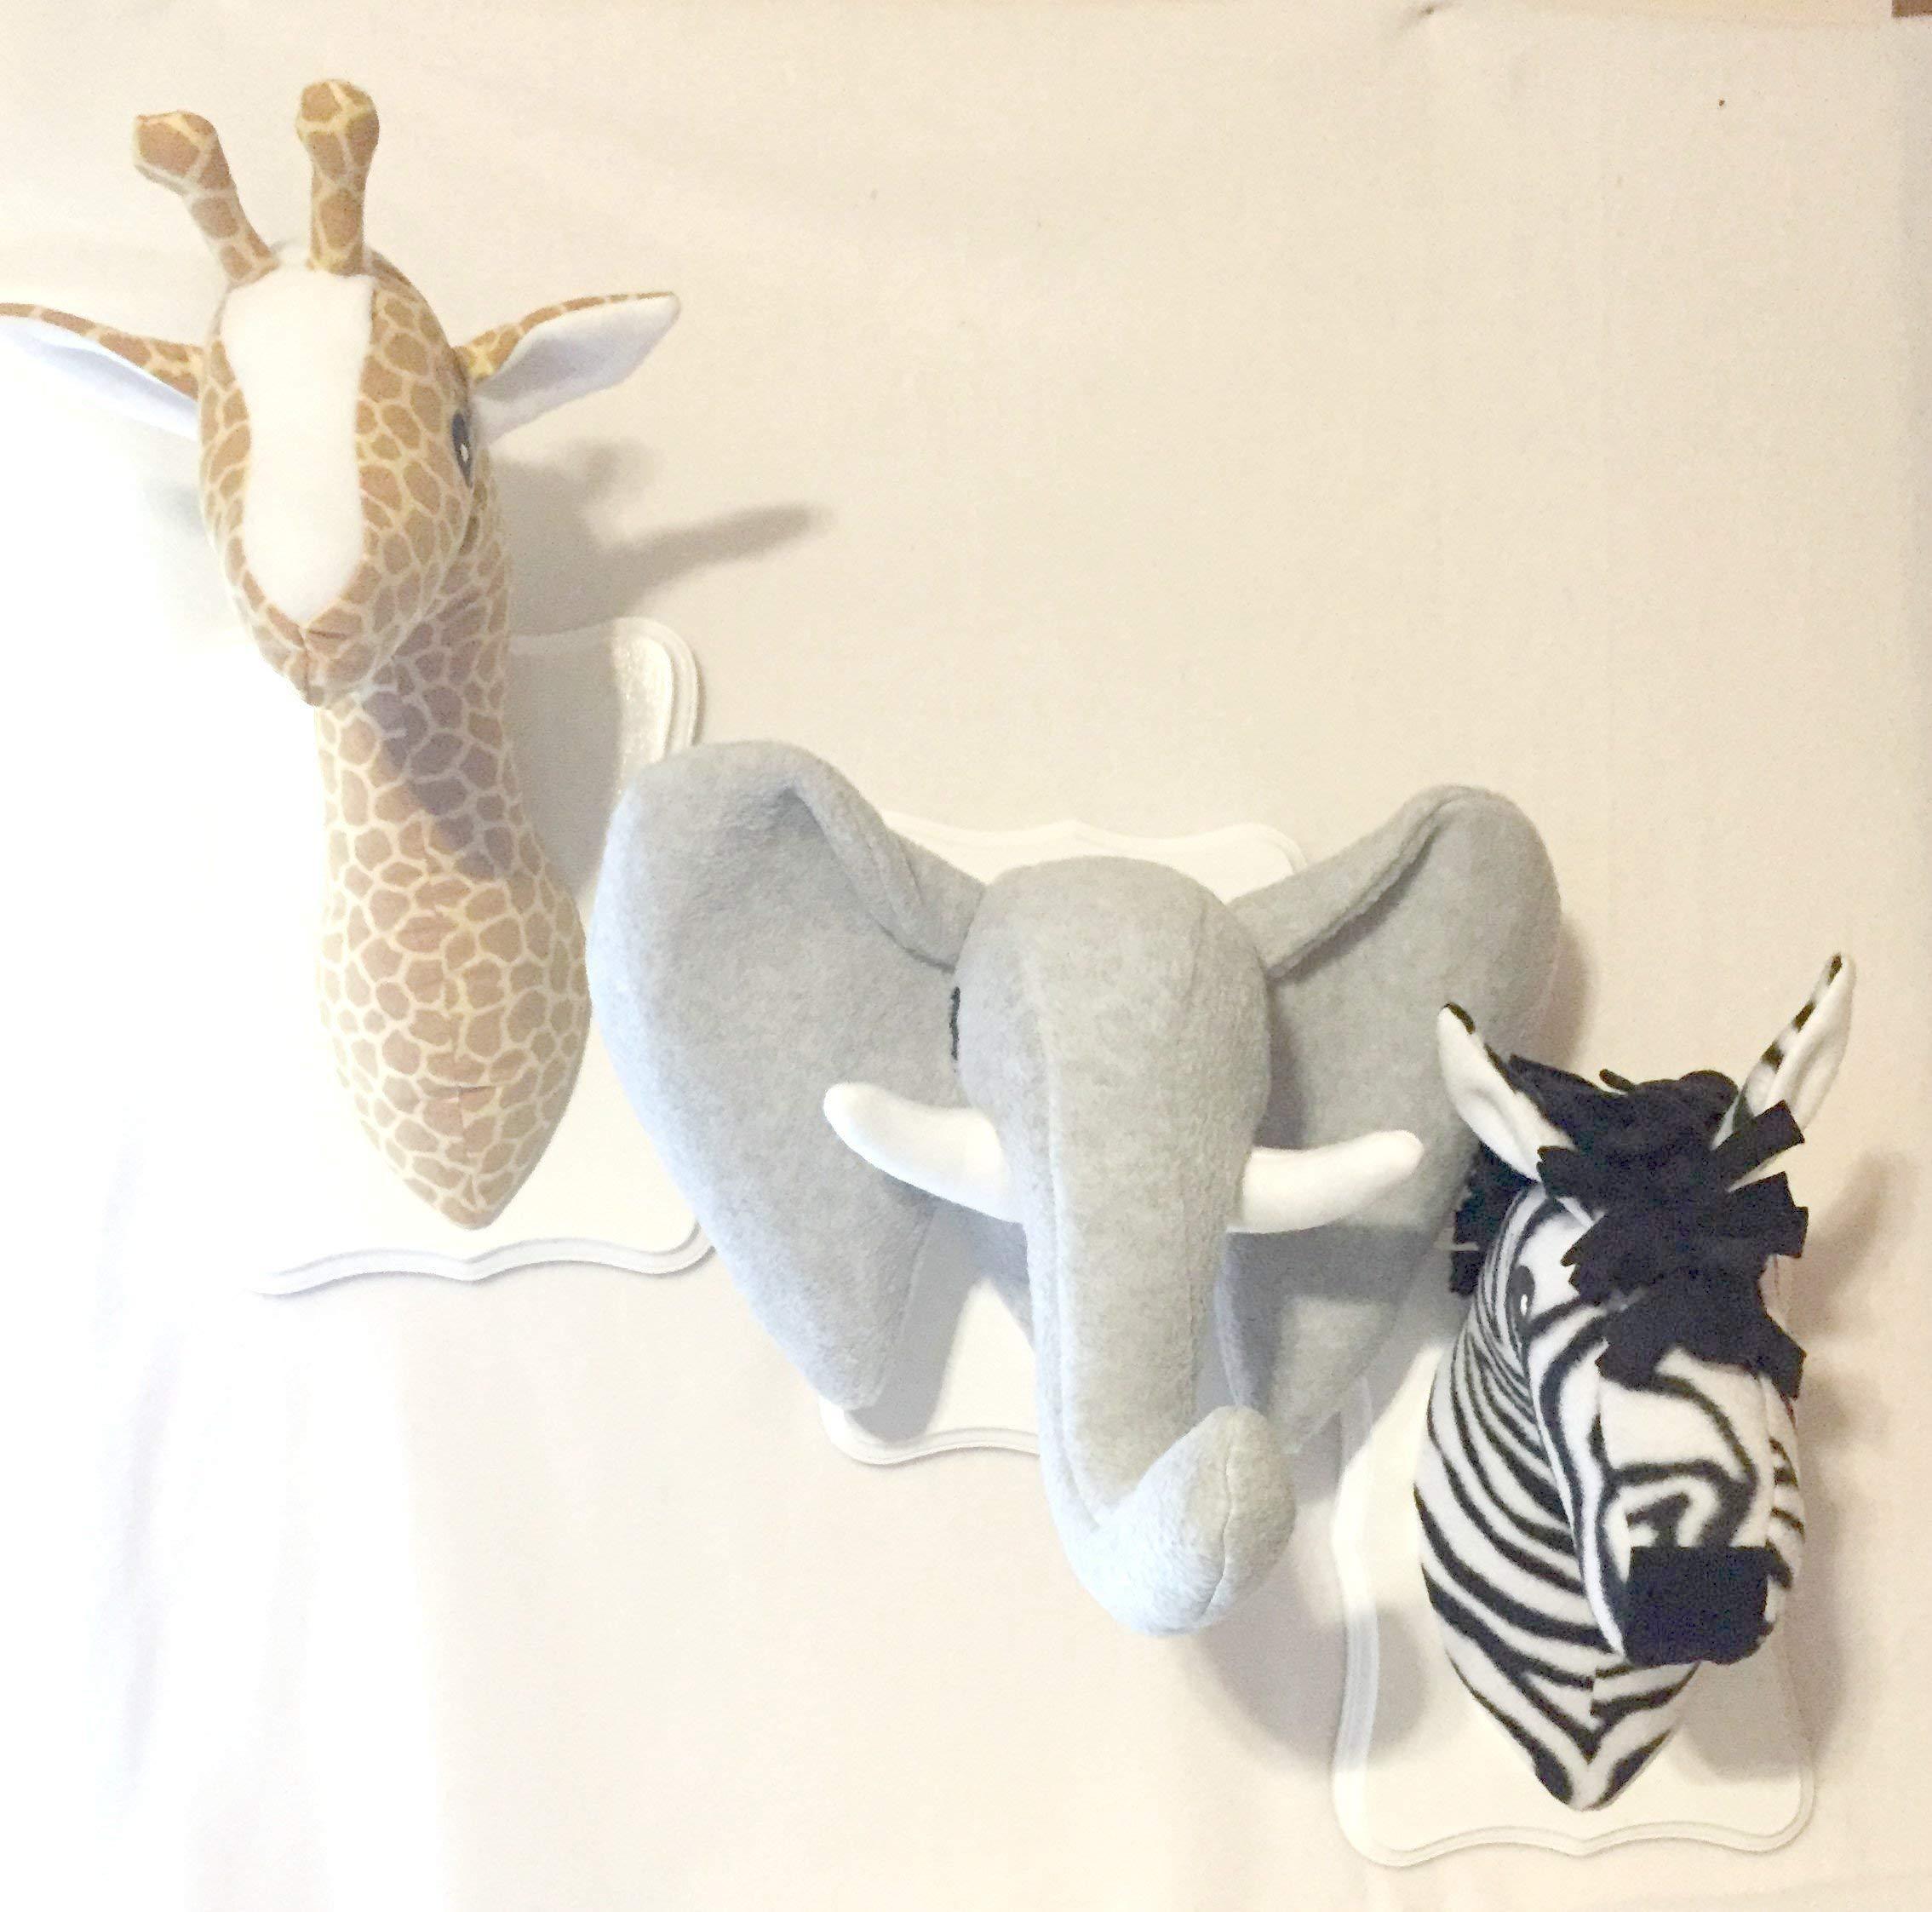 Safari Animal Heads Trio/stuffed animal heads/Faux animal heads/gold giraffe, heather elephant, zebra/best baby shower gifts by Gramma-in-the-Box